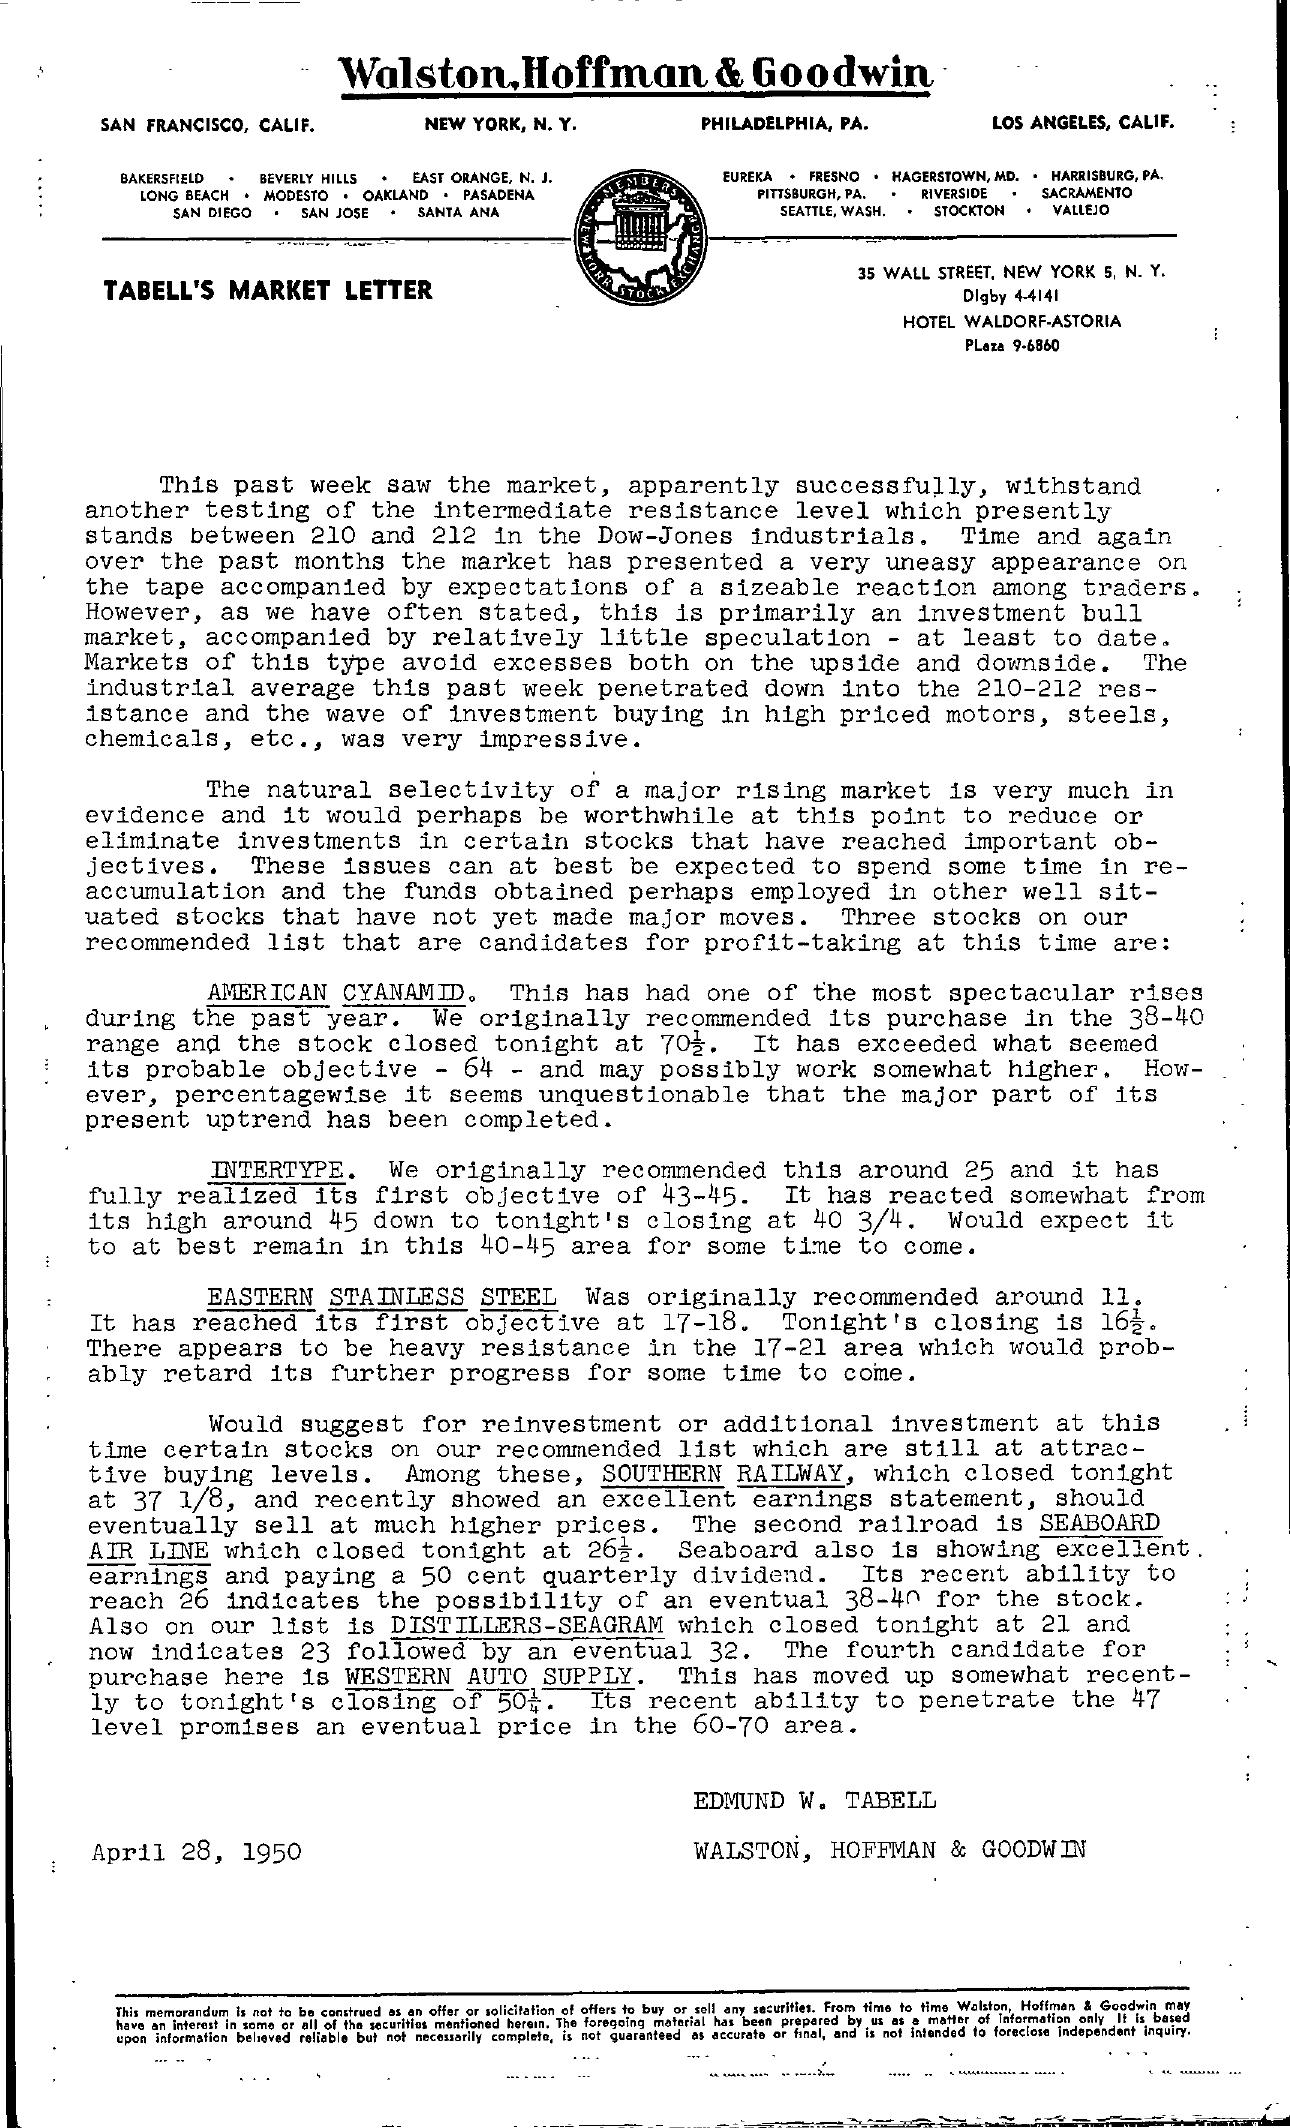 Tabell's Market Letter - April 28, 1950